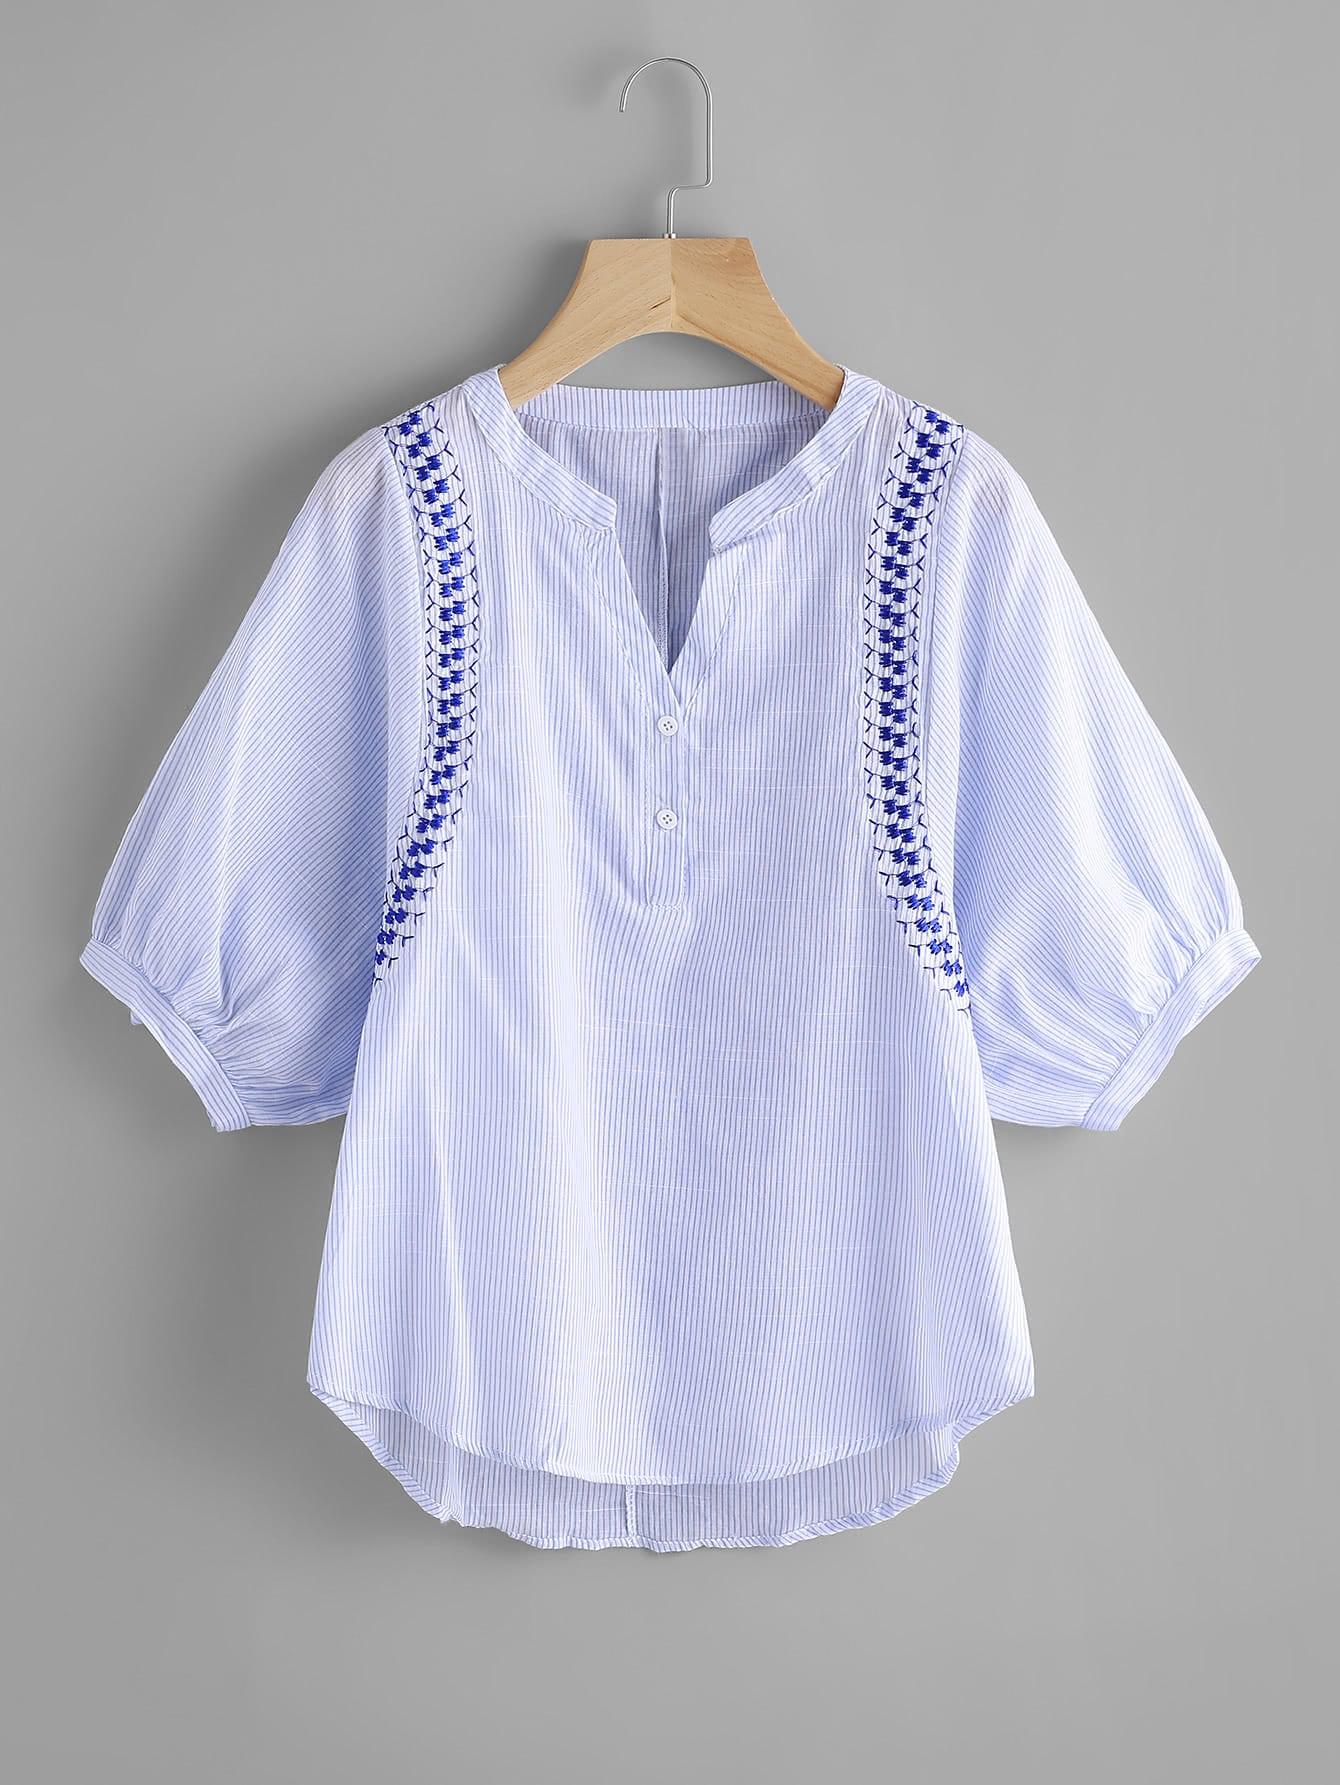 Фото Vertical Striped Embroidery Lantern Sleeve Blouse. Купить с доставкой